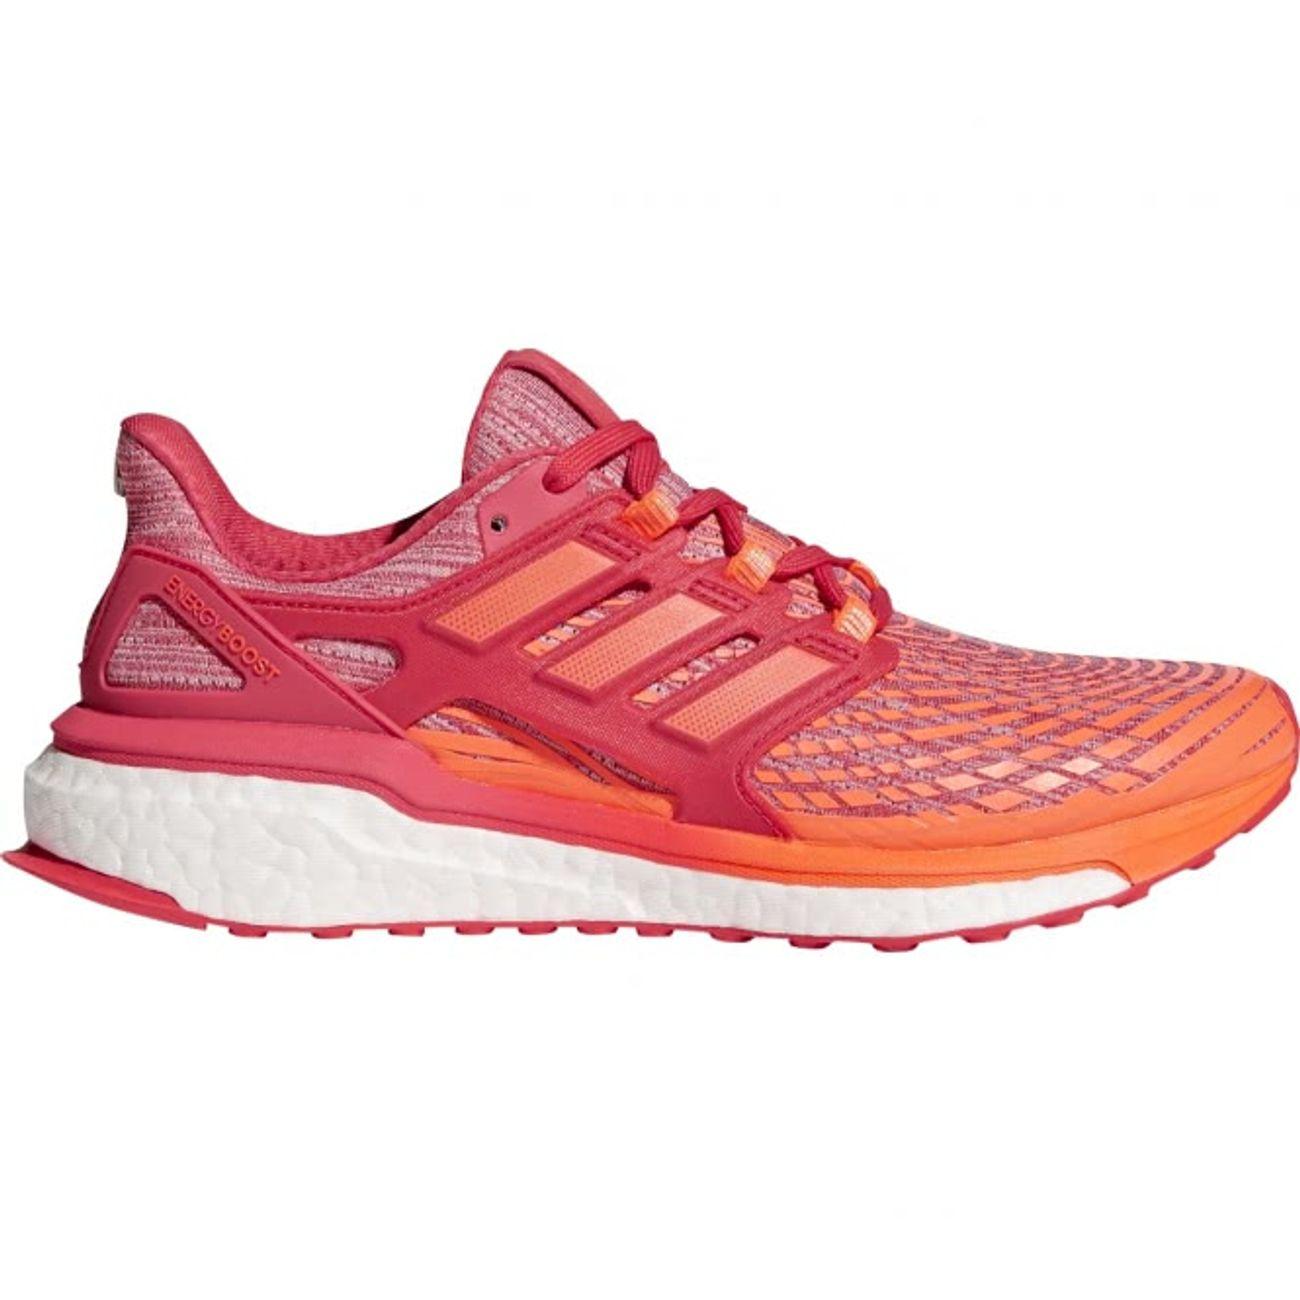 adidas sportif chaussures moins cher,adidas orange femme